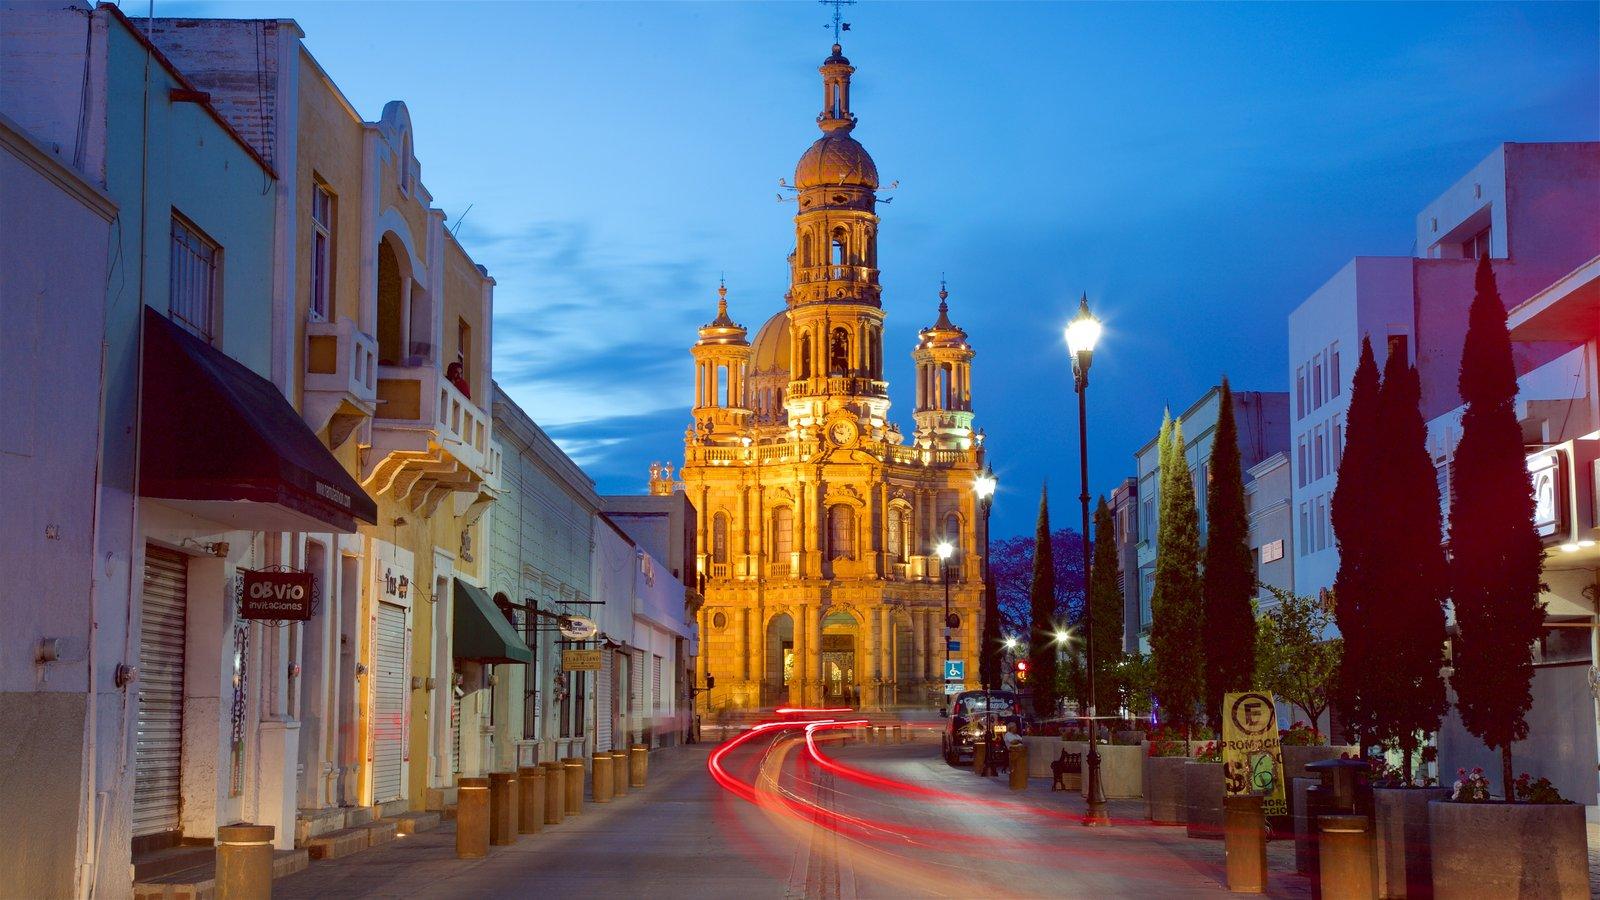 202121-Plaza-En-Aguascalientes (1).jpg